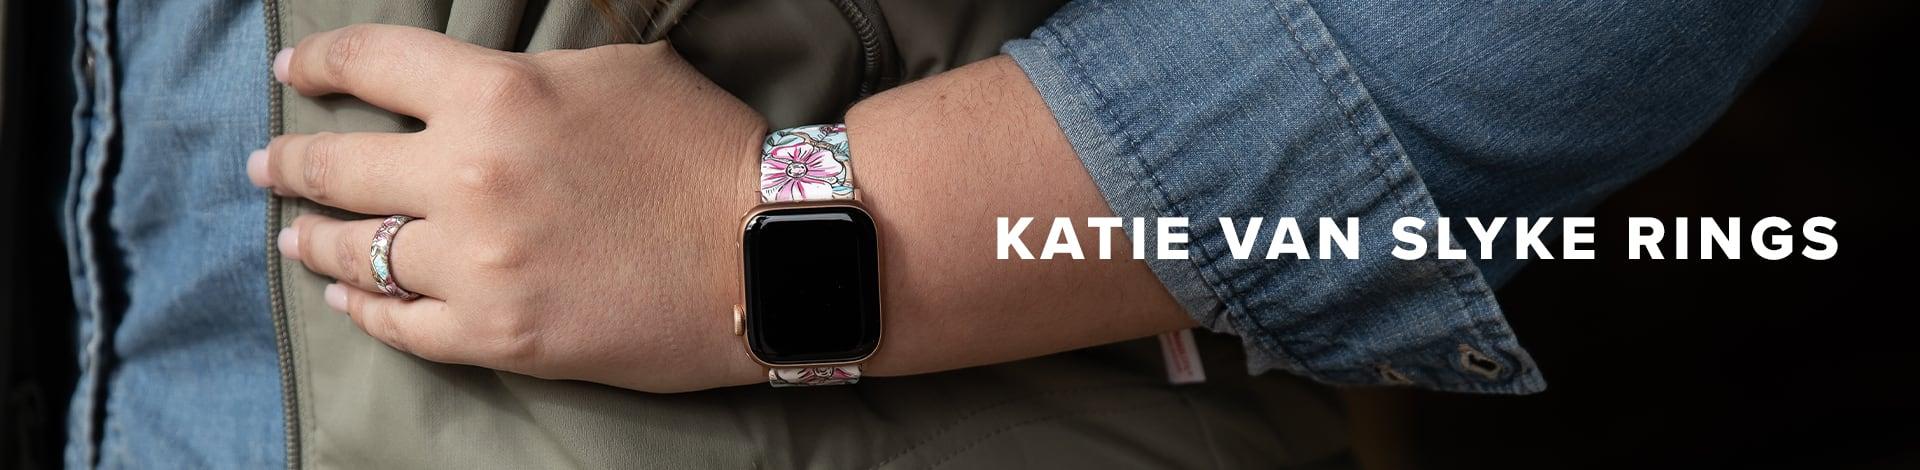 Katie Van Slyke rings, Katie in the background with her hand on her hip